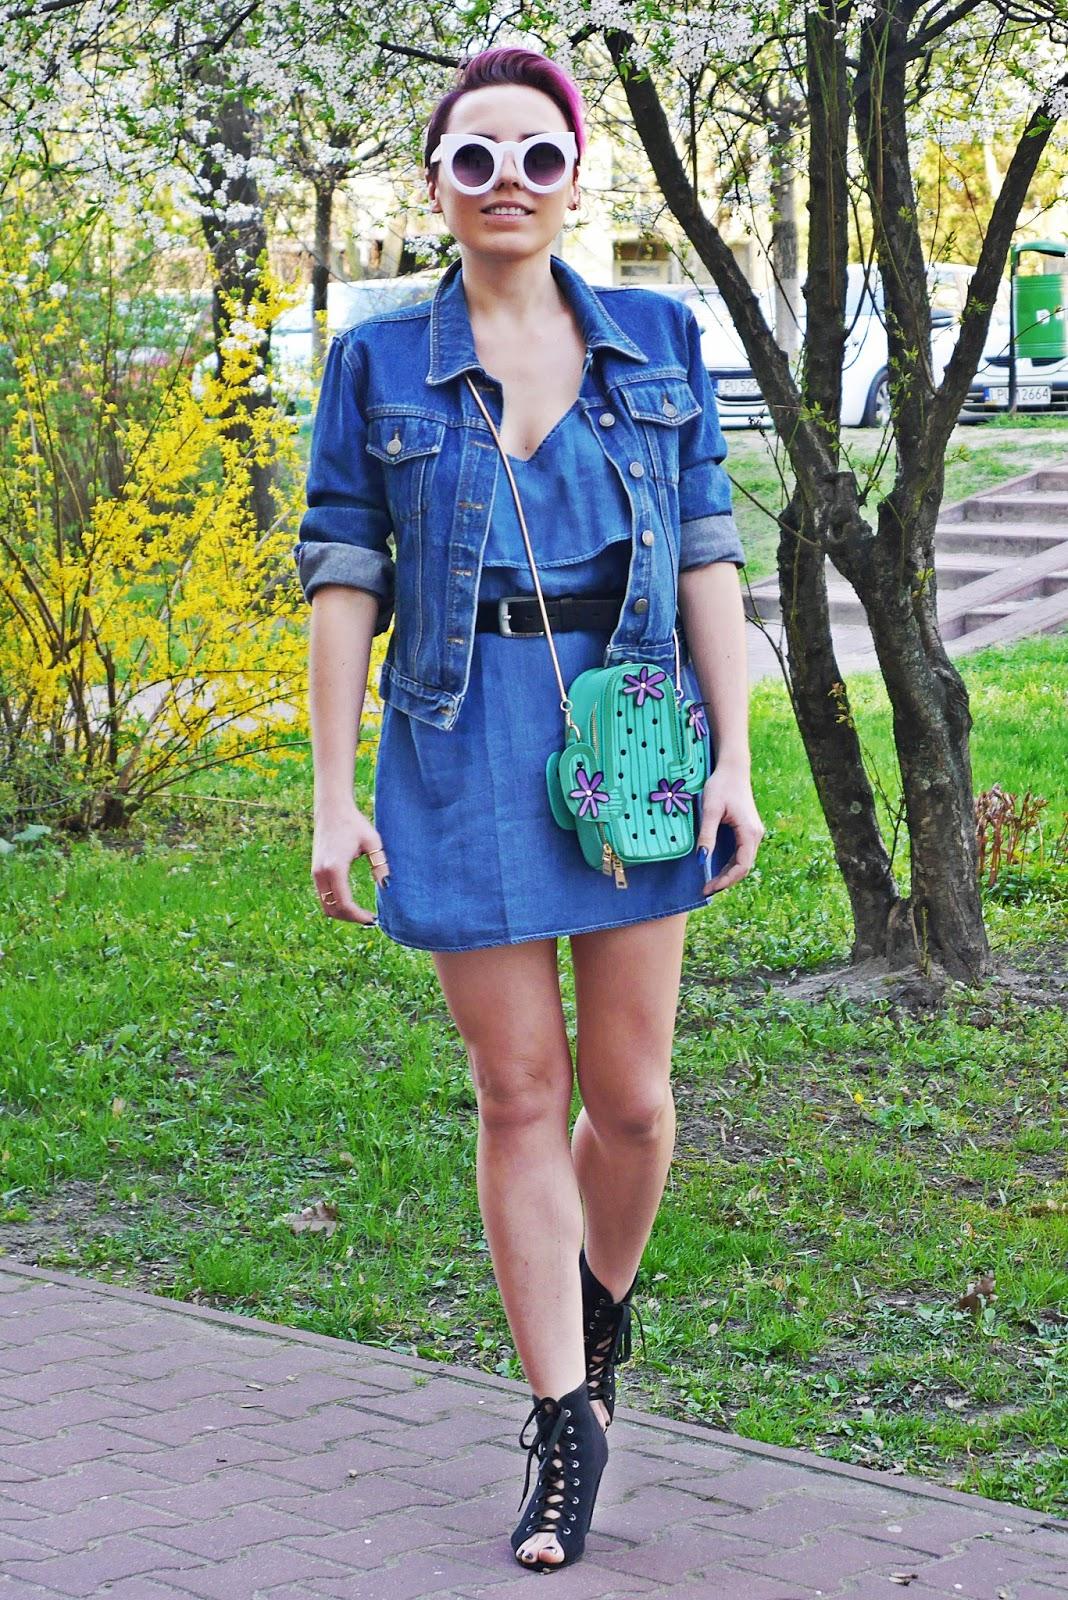 denim_dress_cactus_bag_zaful_sammydress_karyn_look_ootd_outfit_120417